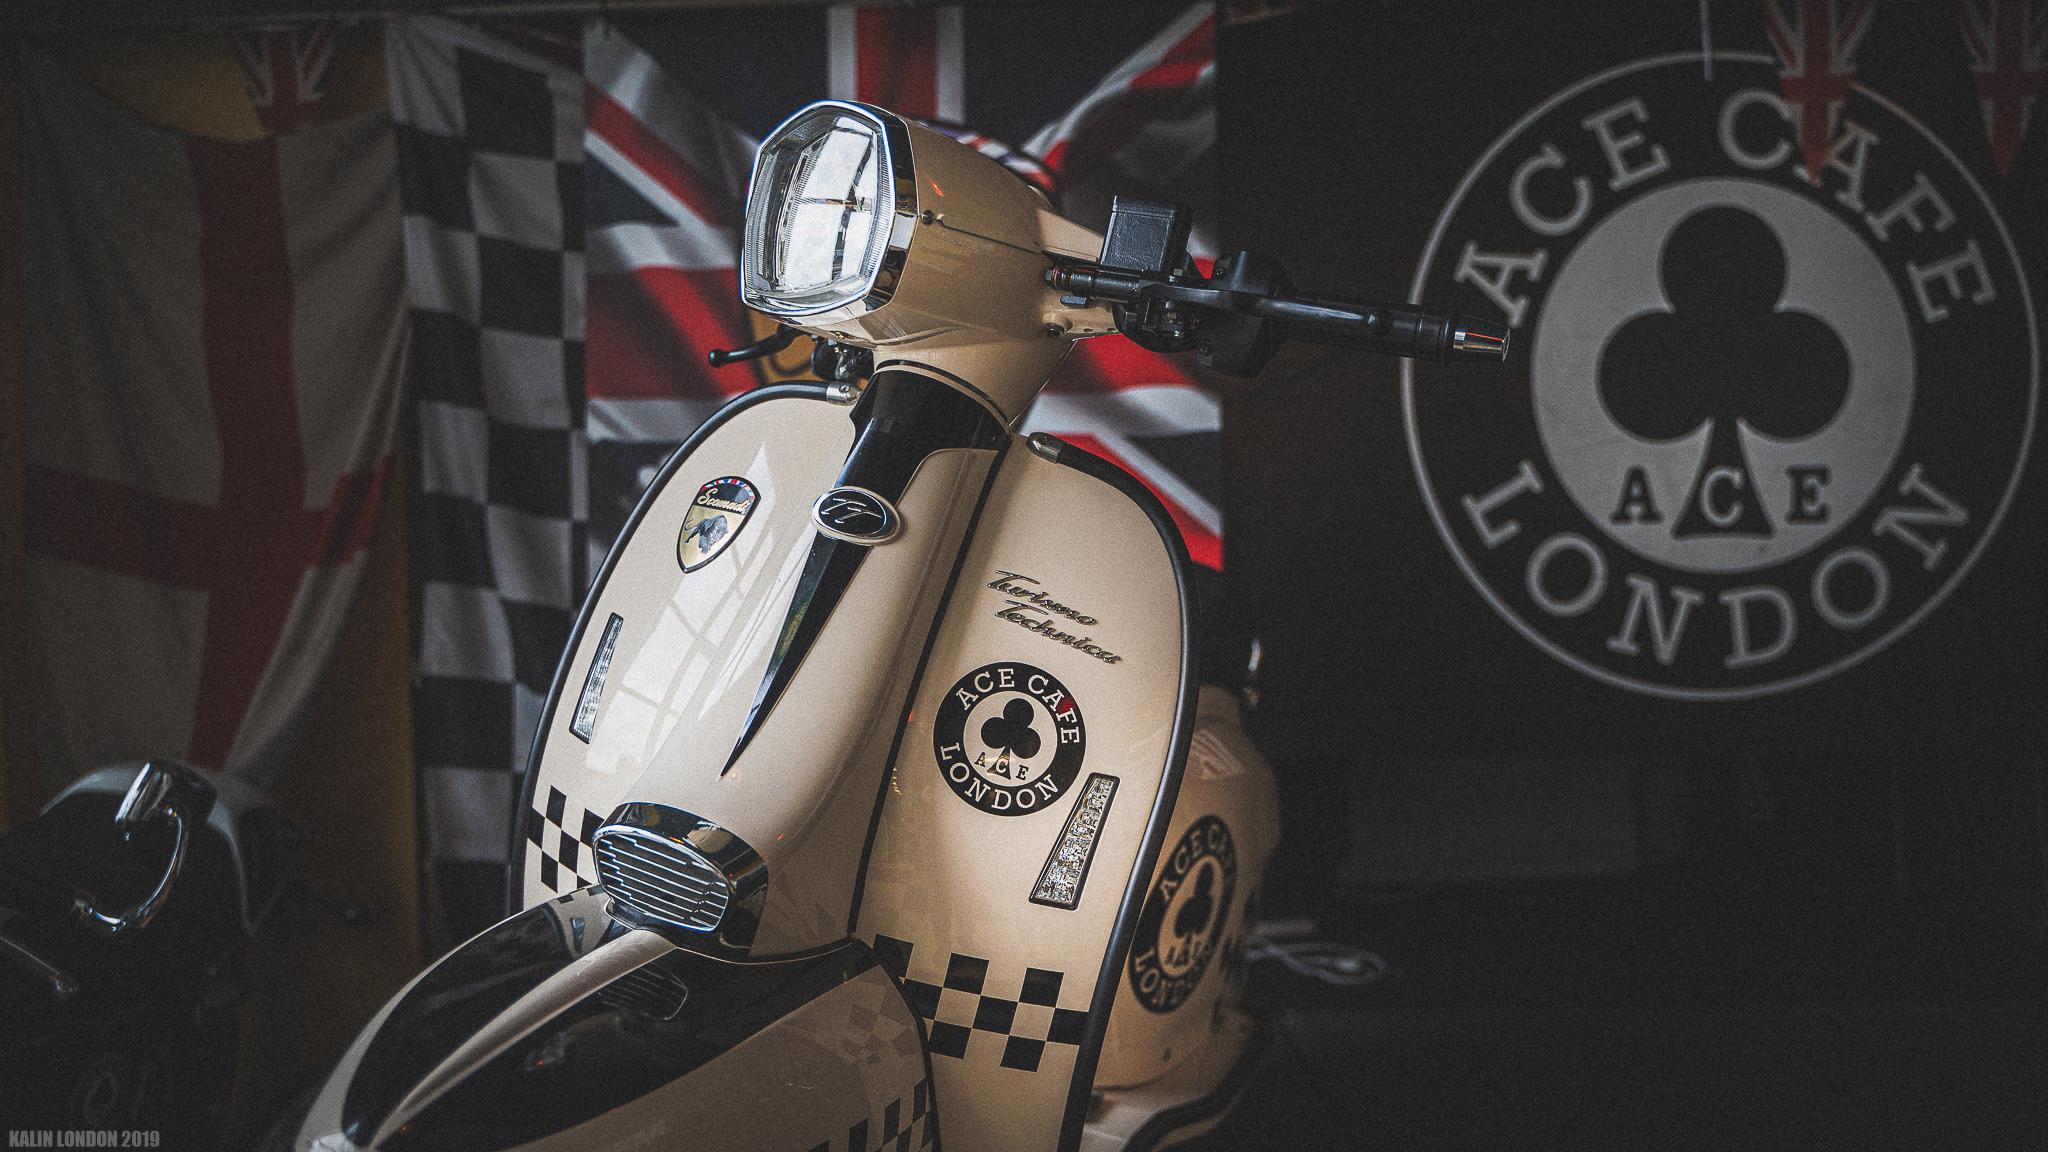 Ace Cafe London Aug 2019